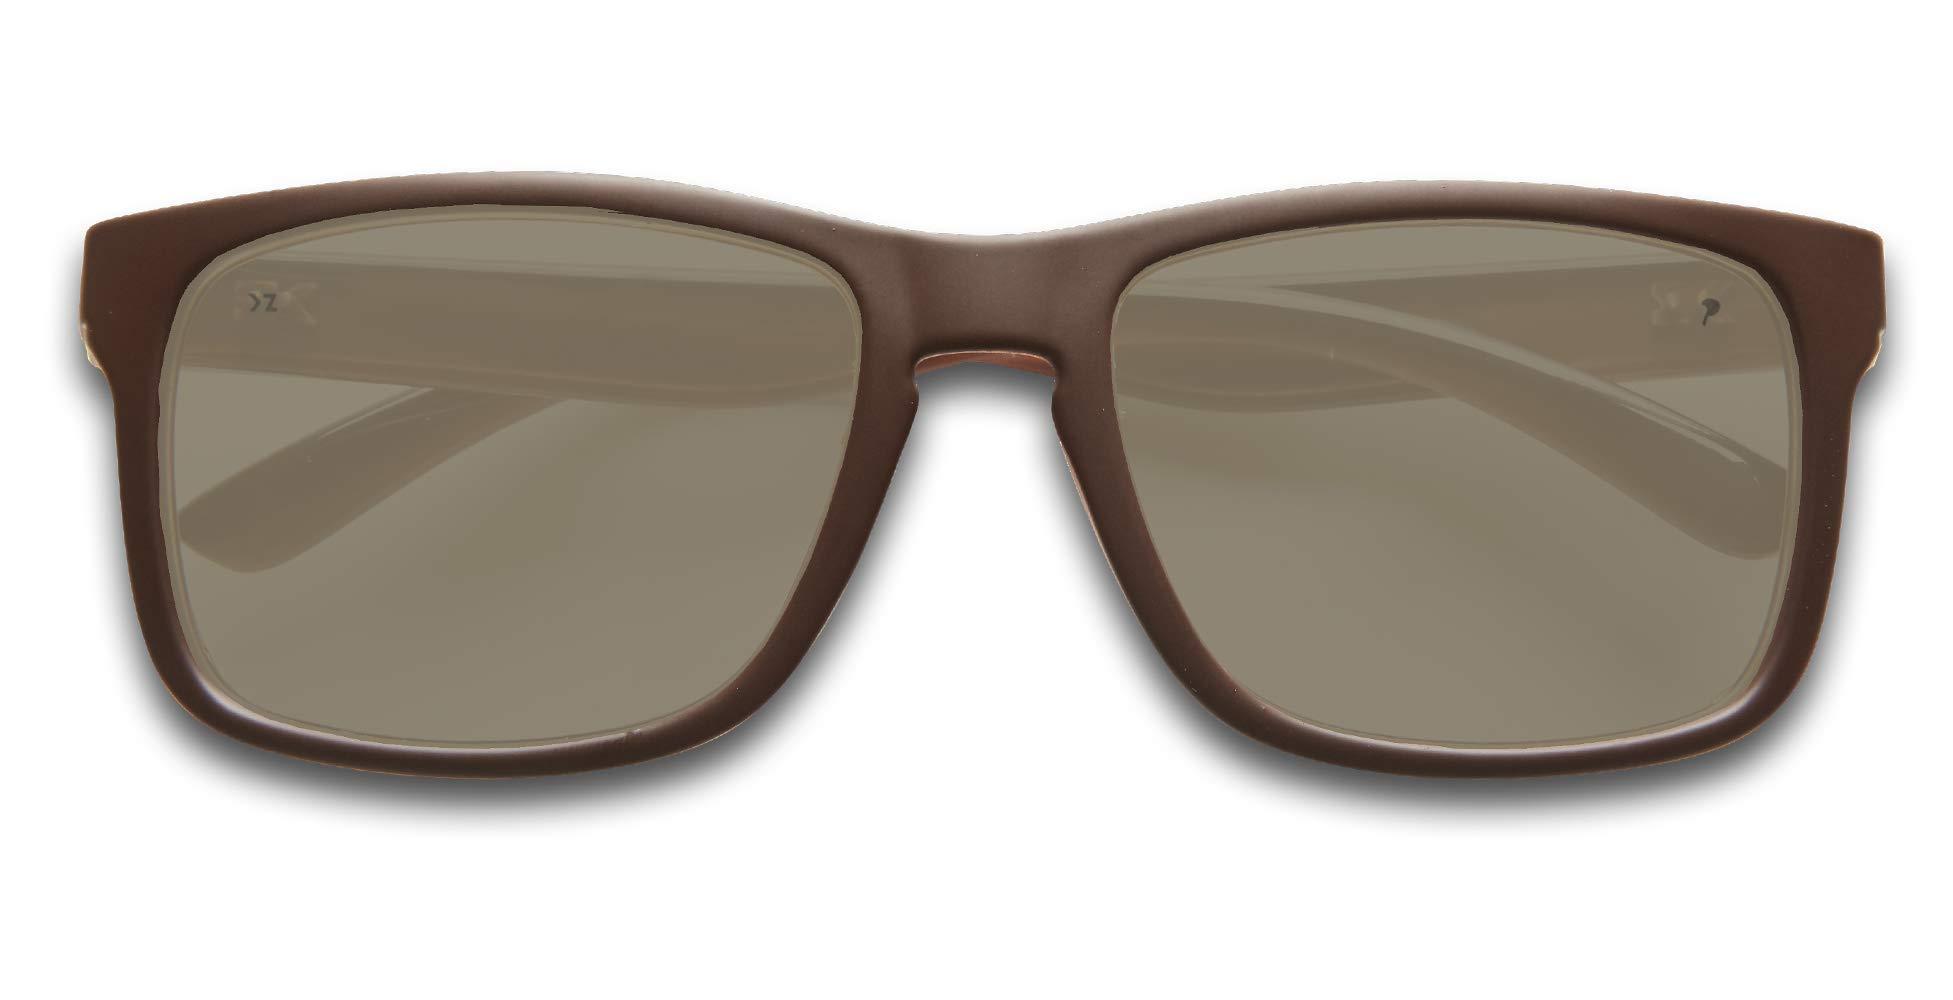 8206ac92ff4fa KZ Gear - FLOATING SUNGLASSES - Medium Frame - Classic Modern Shaped -  Polarized UV400 Lenses